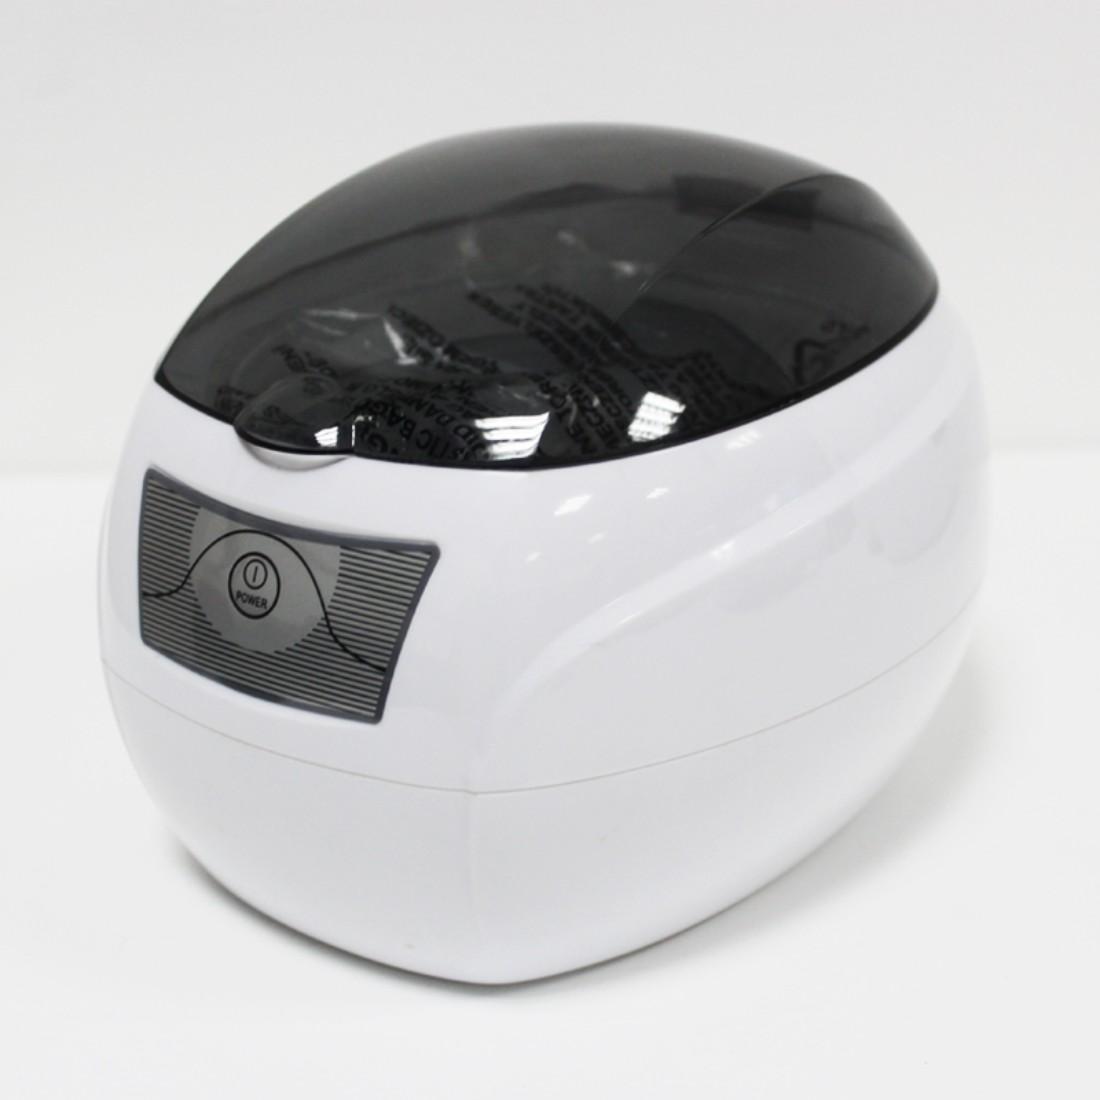 Smart key ultrasonic cleaning machine glasses cleaning machine denture jewelry cd cleaning machine jp-900(China (Mainland))